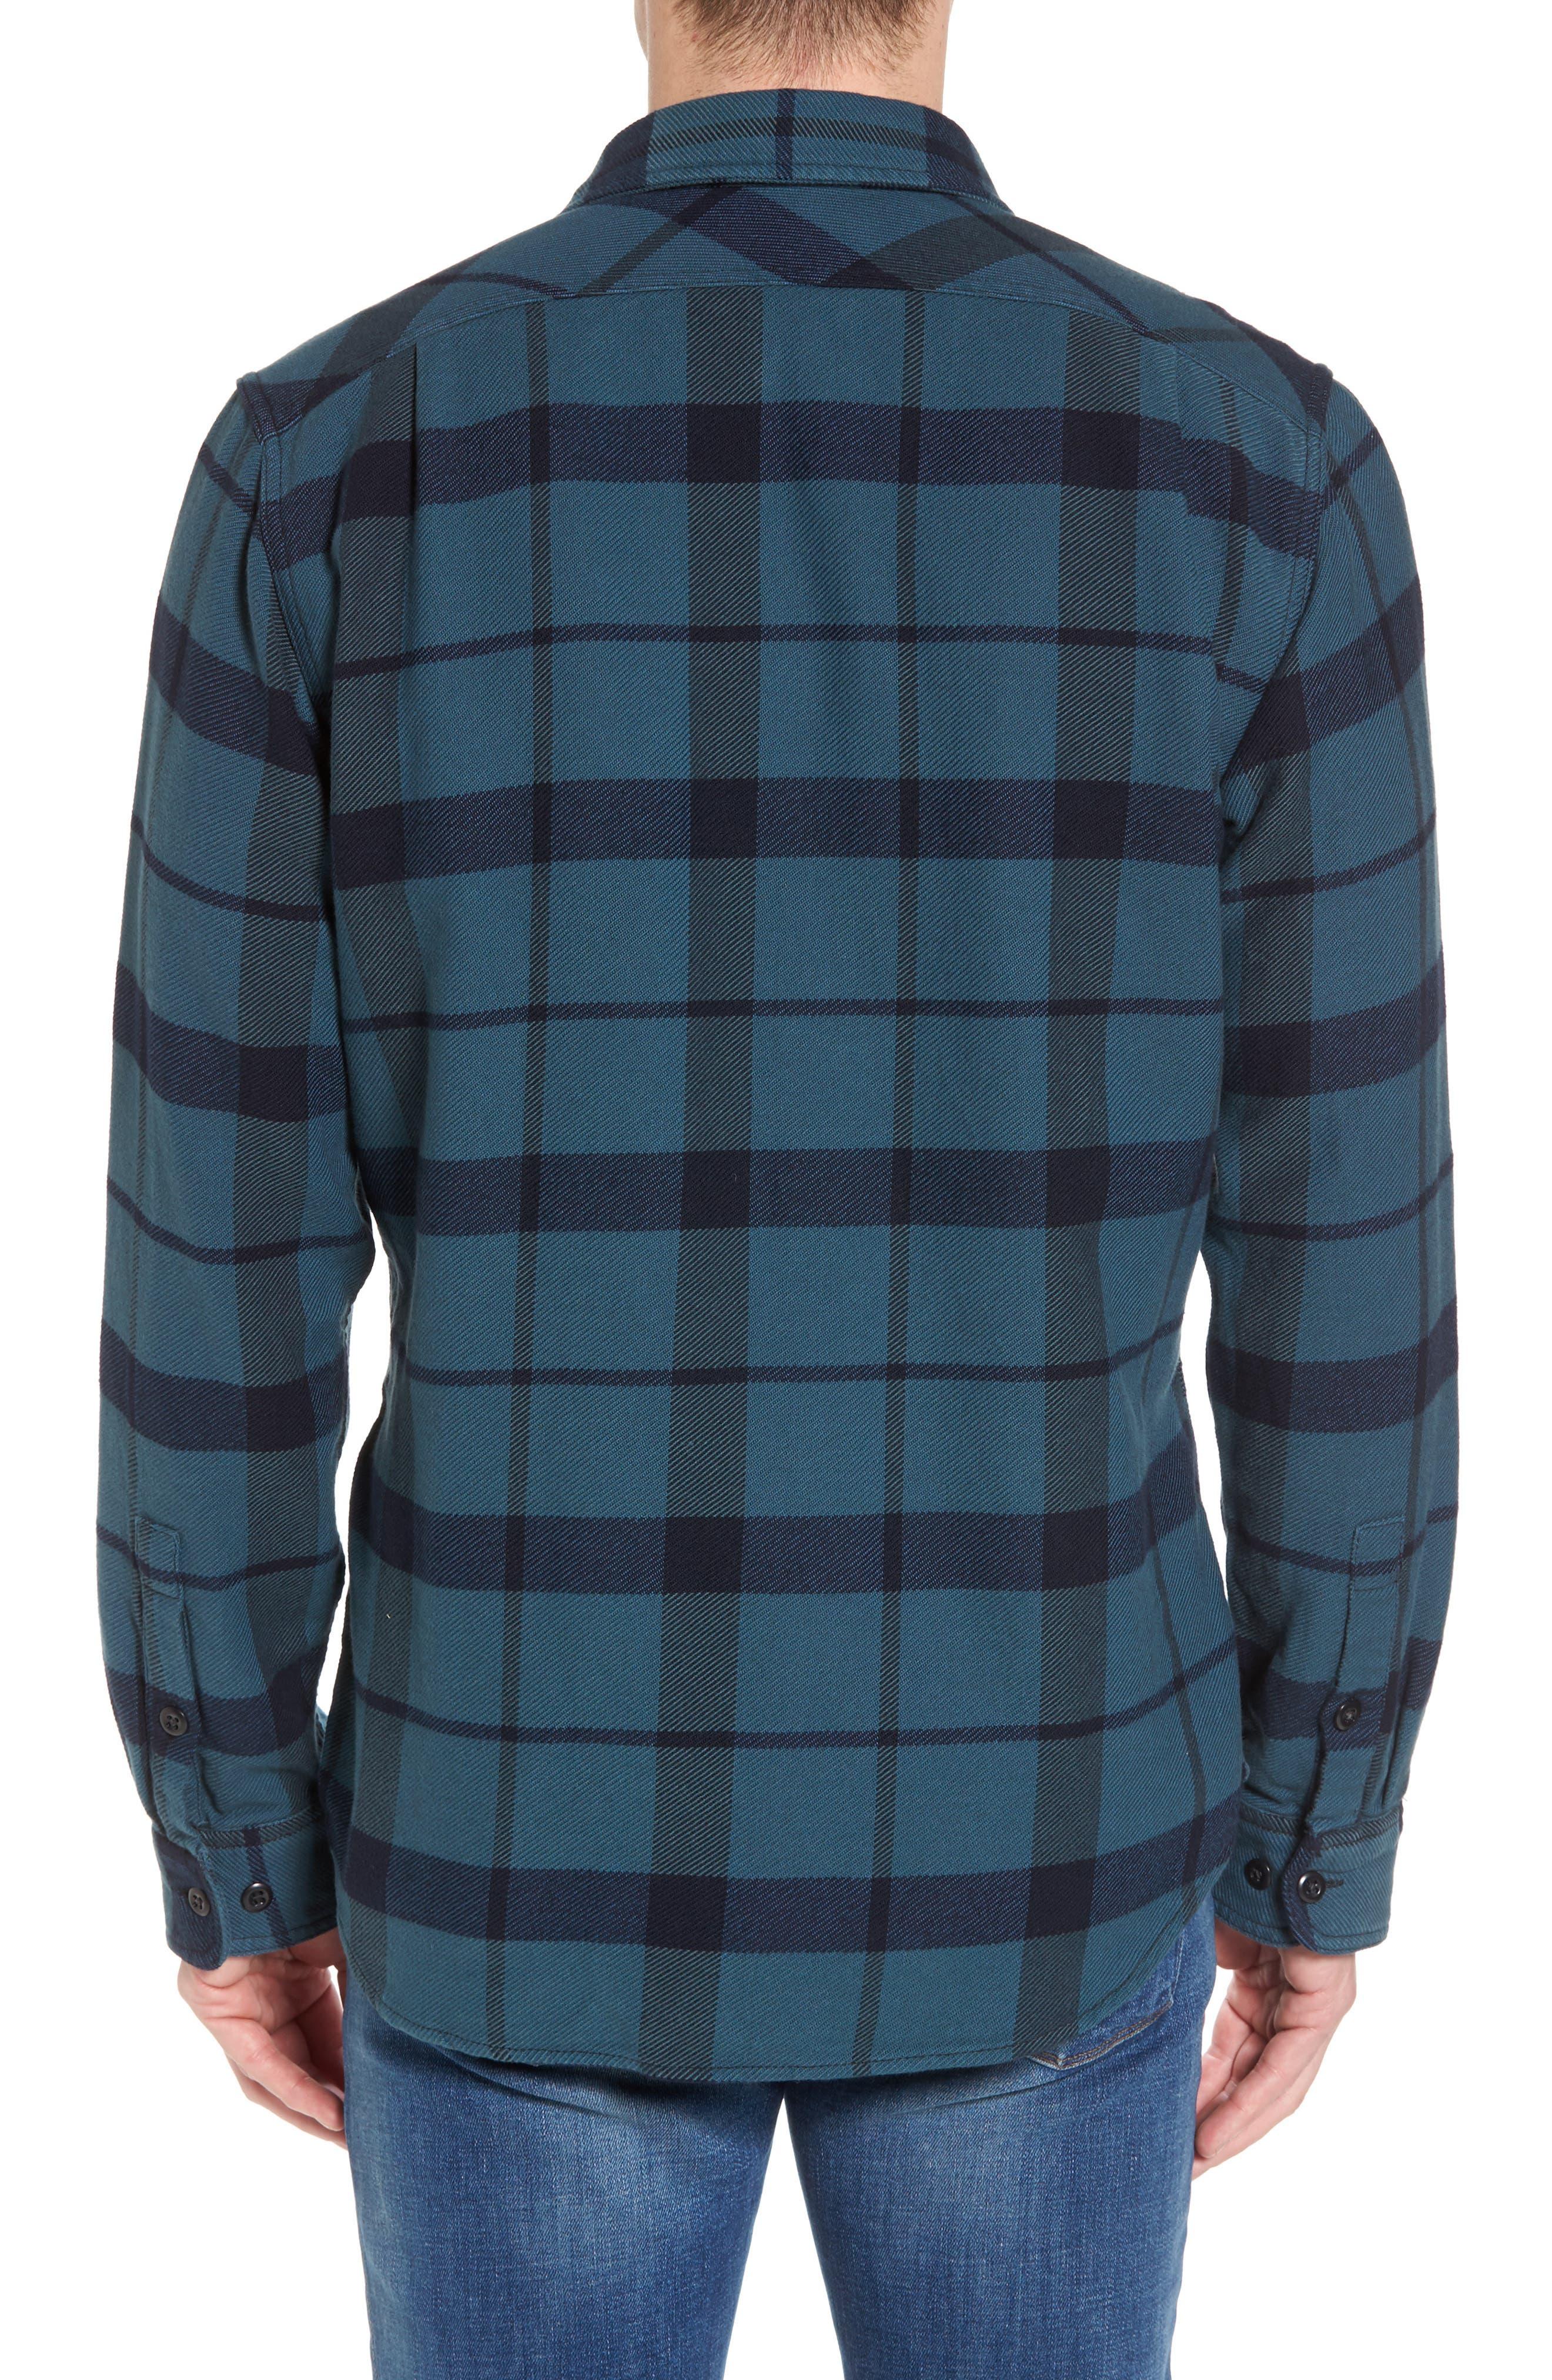 'Vintage Flannel' Regular Fit Plaid Cotton Shirt,                             Alternate thumbnail 7, color,                             Brown/ Navy